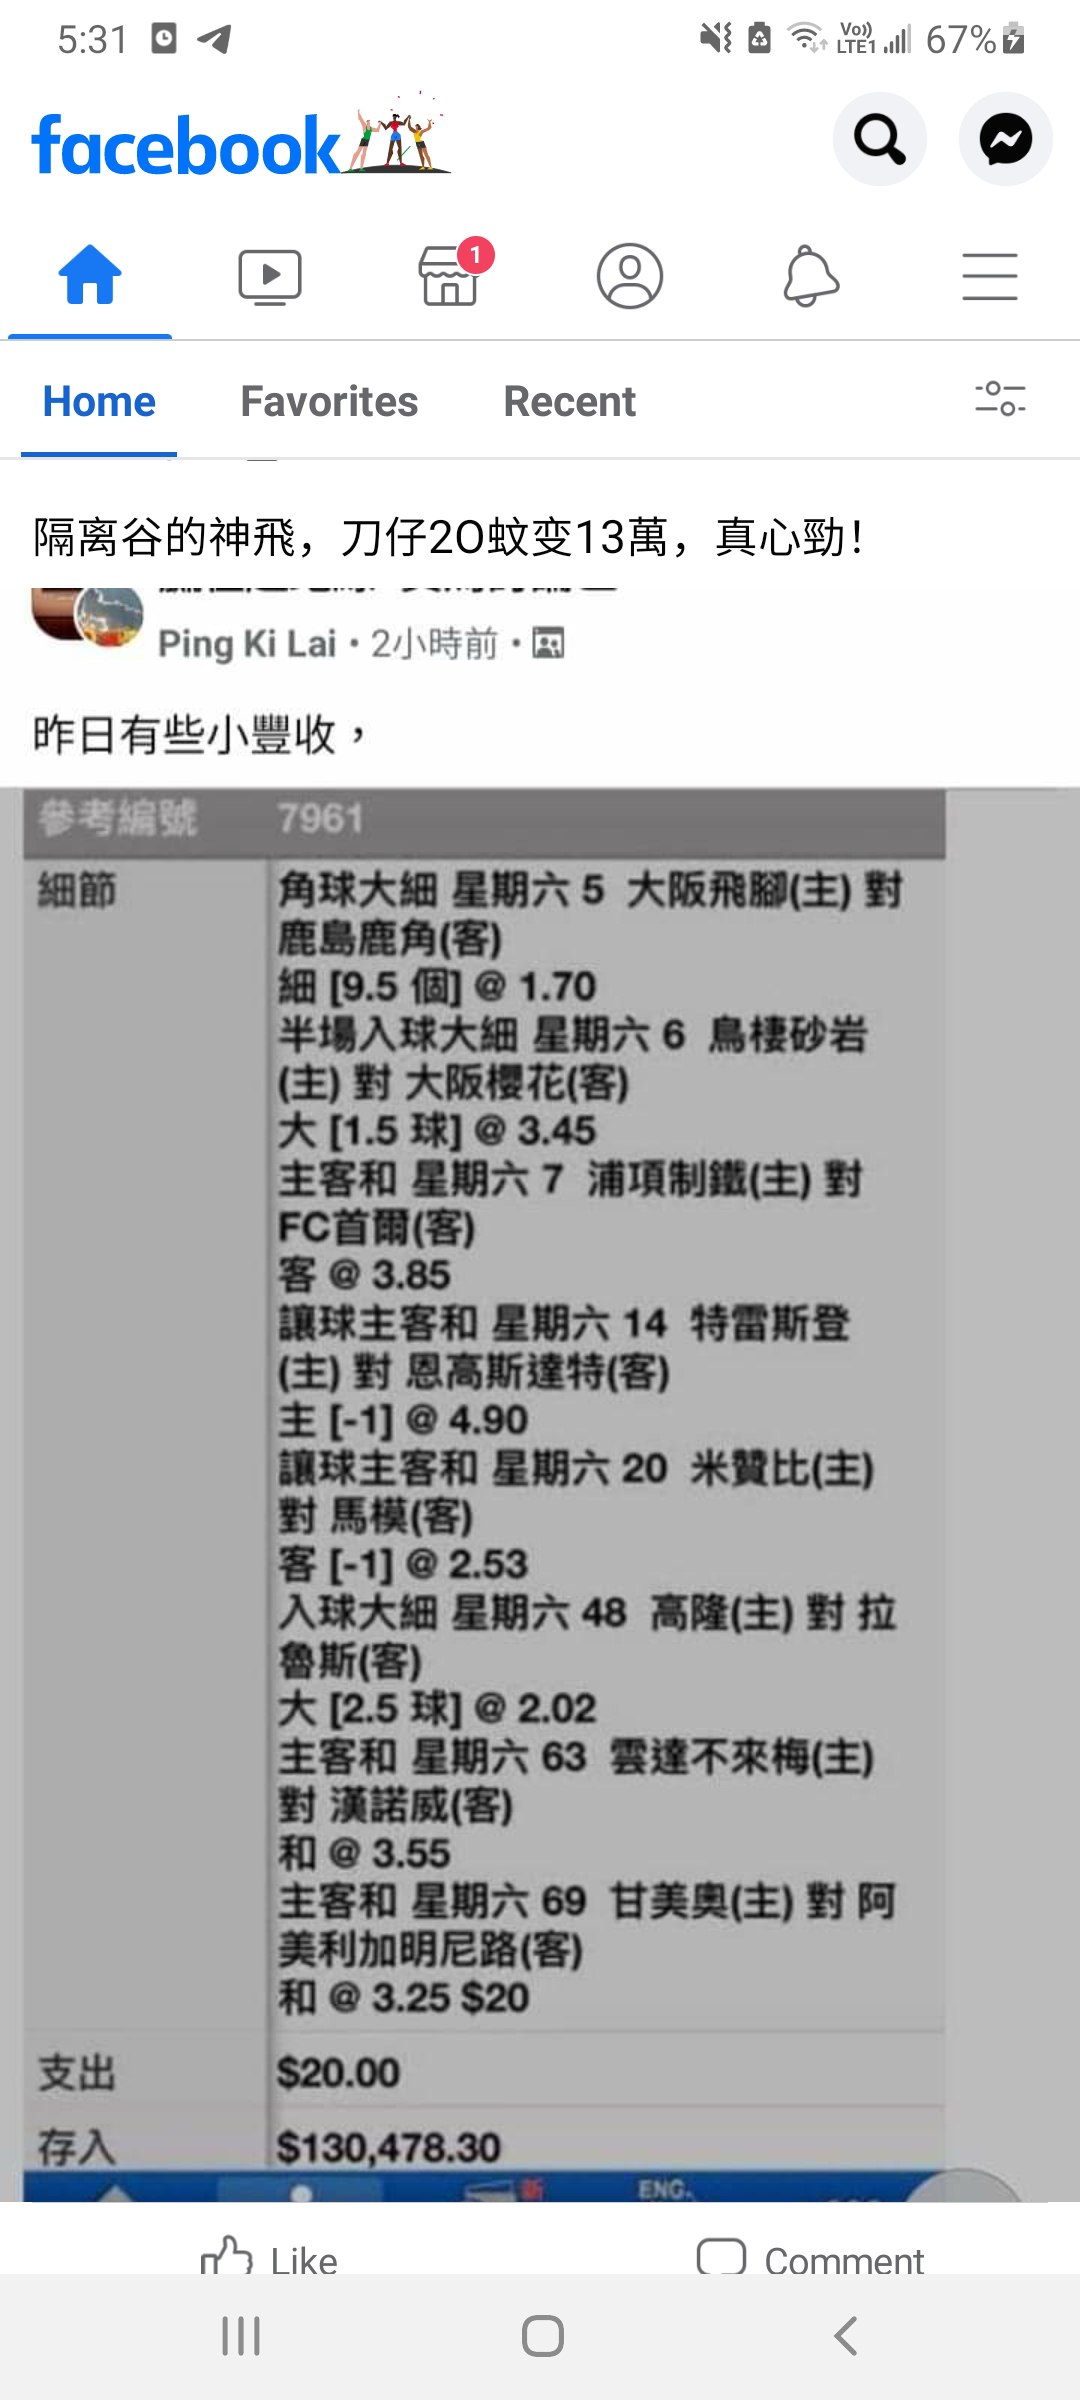 https://upload.hkgolden.media/comment/1o4gflr0.wlgqlgbcdlt.32yx2inrt2n.2gs.jpg